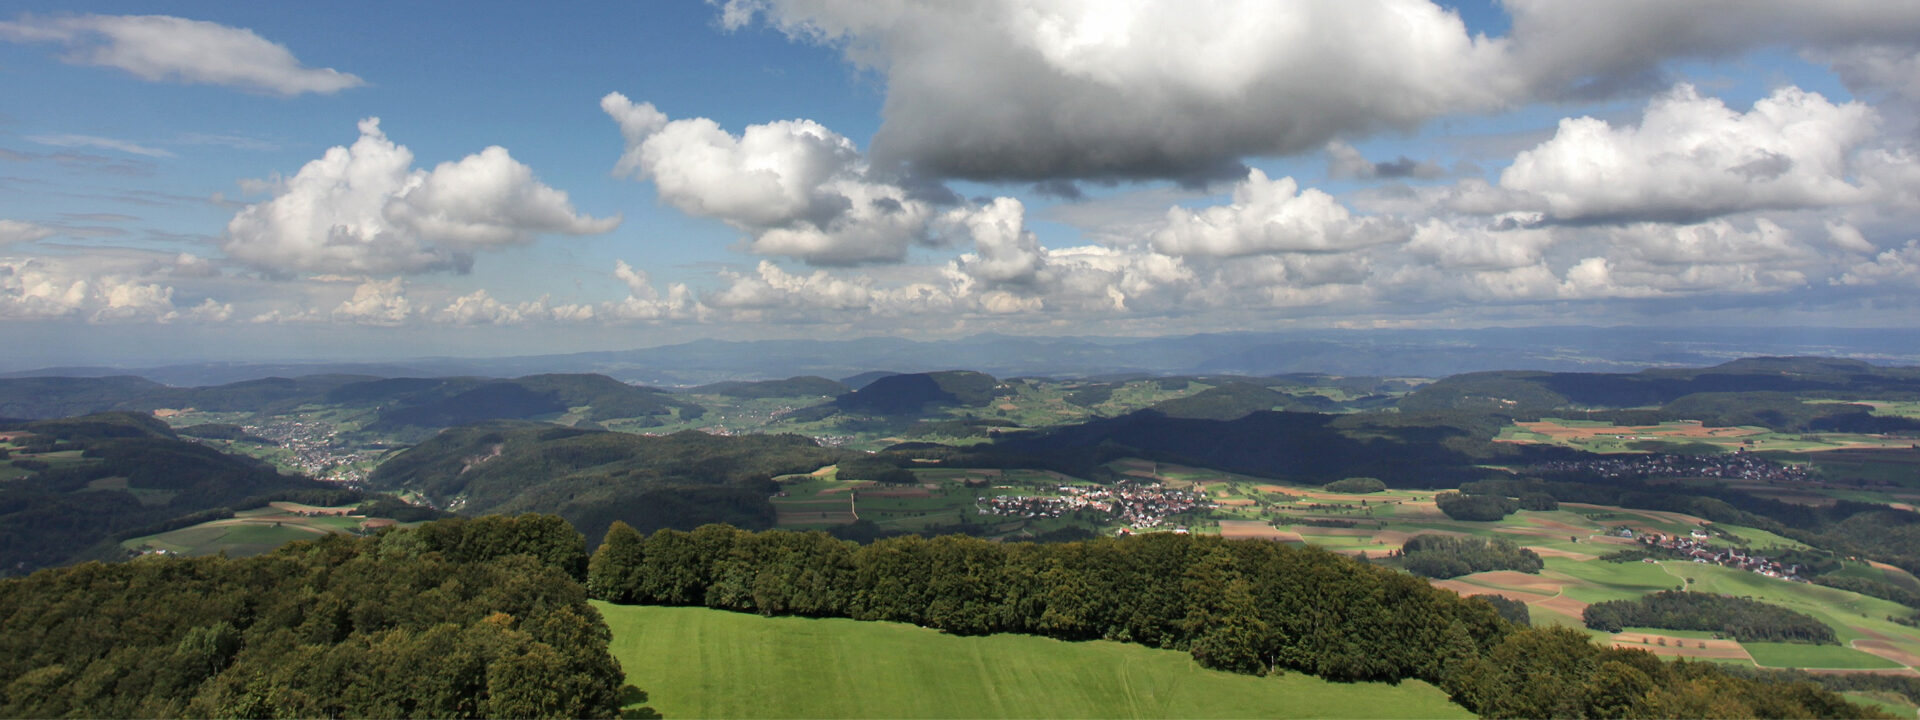 Wisenbergturm